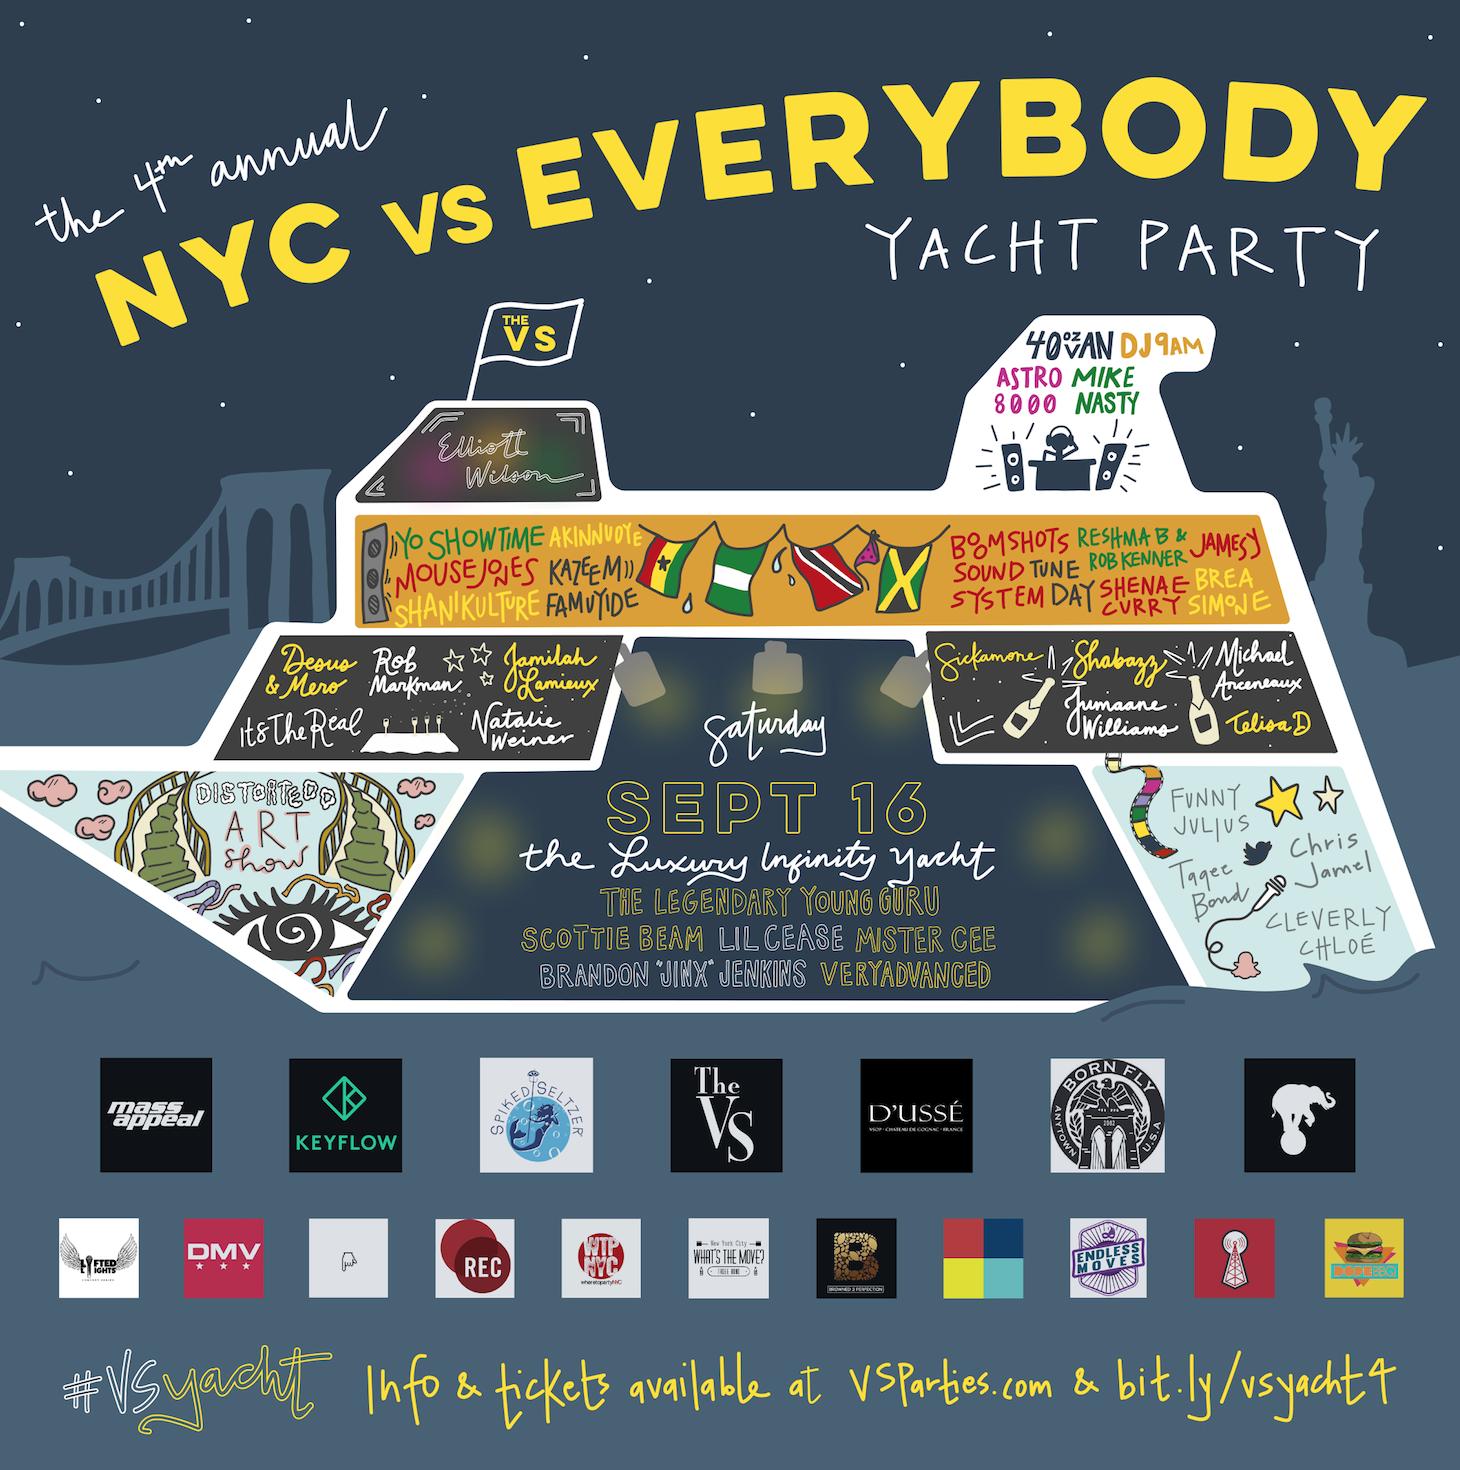 NYCvsEverybody Flier_LianaTeresa